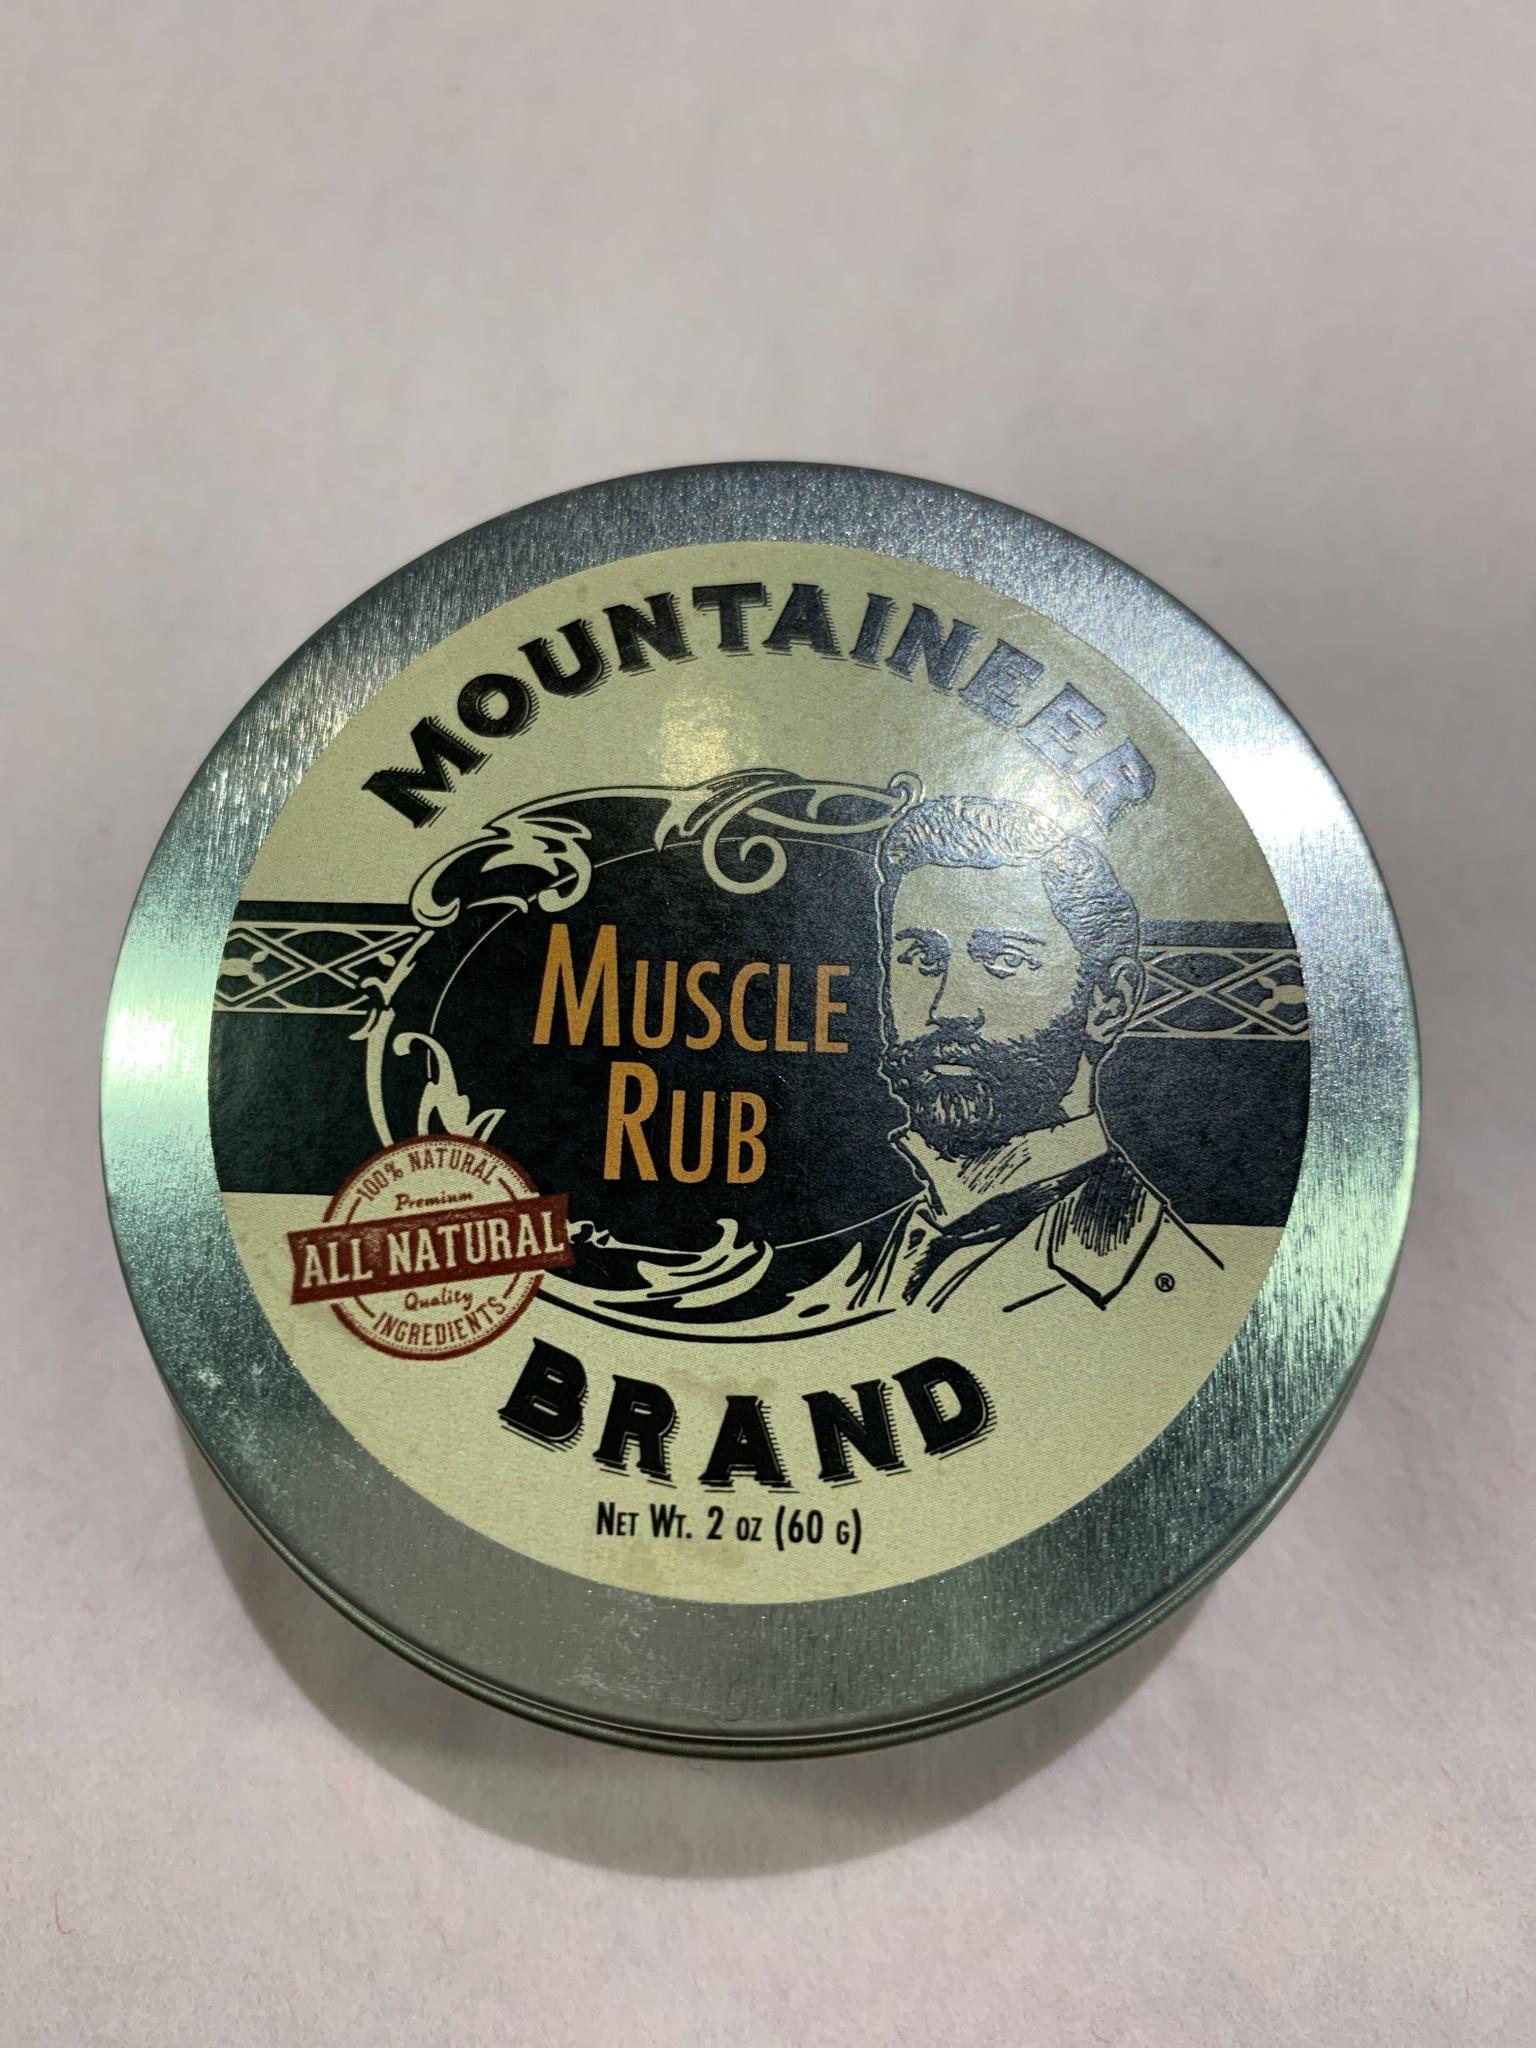 Mountaineer Brand Sore Muscle Rub